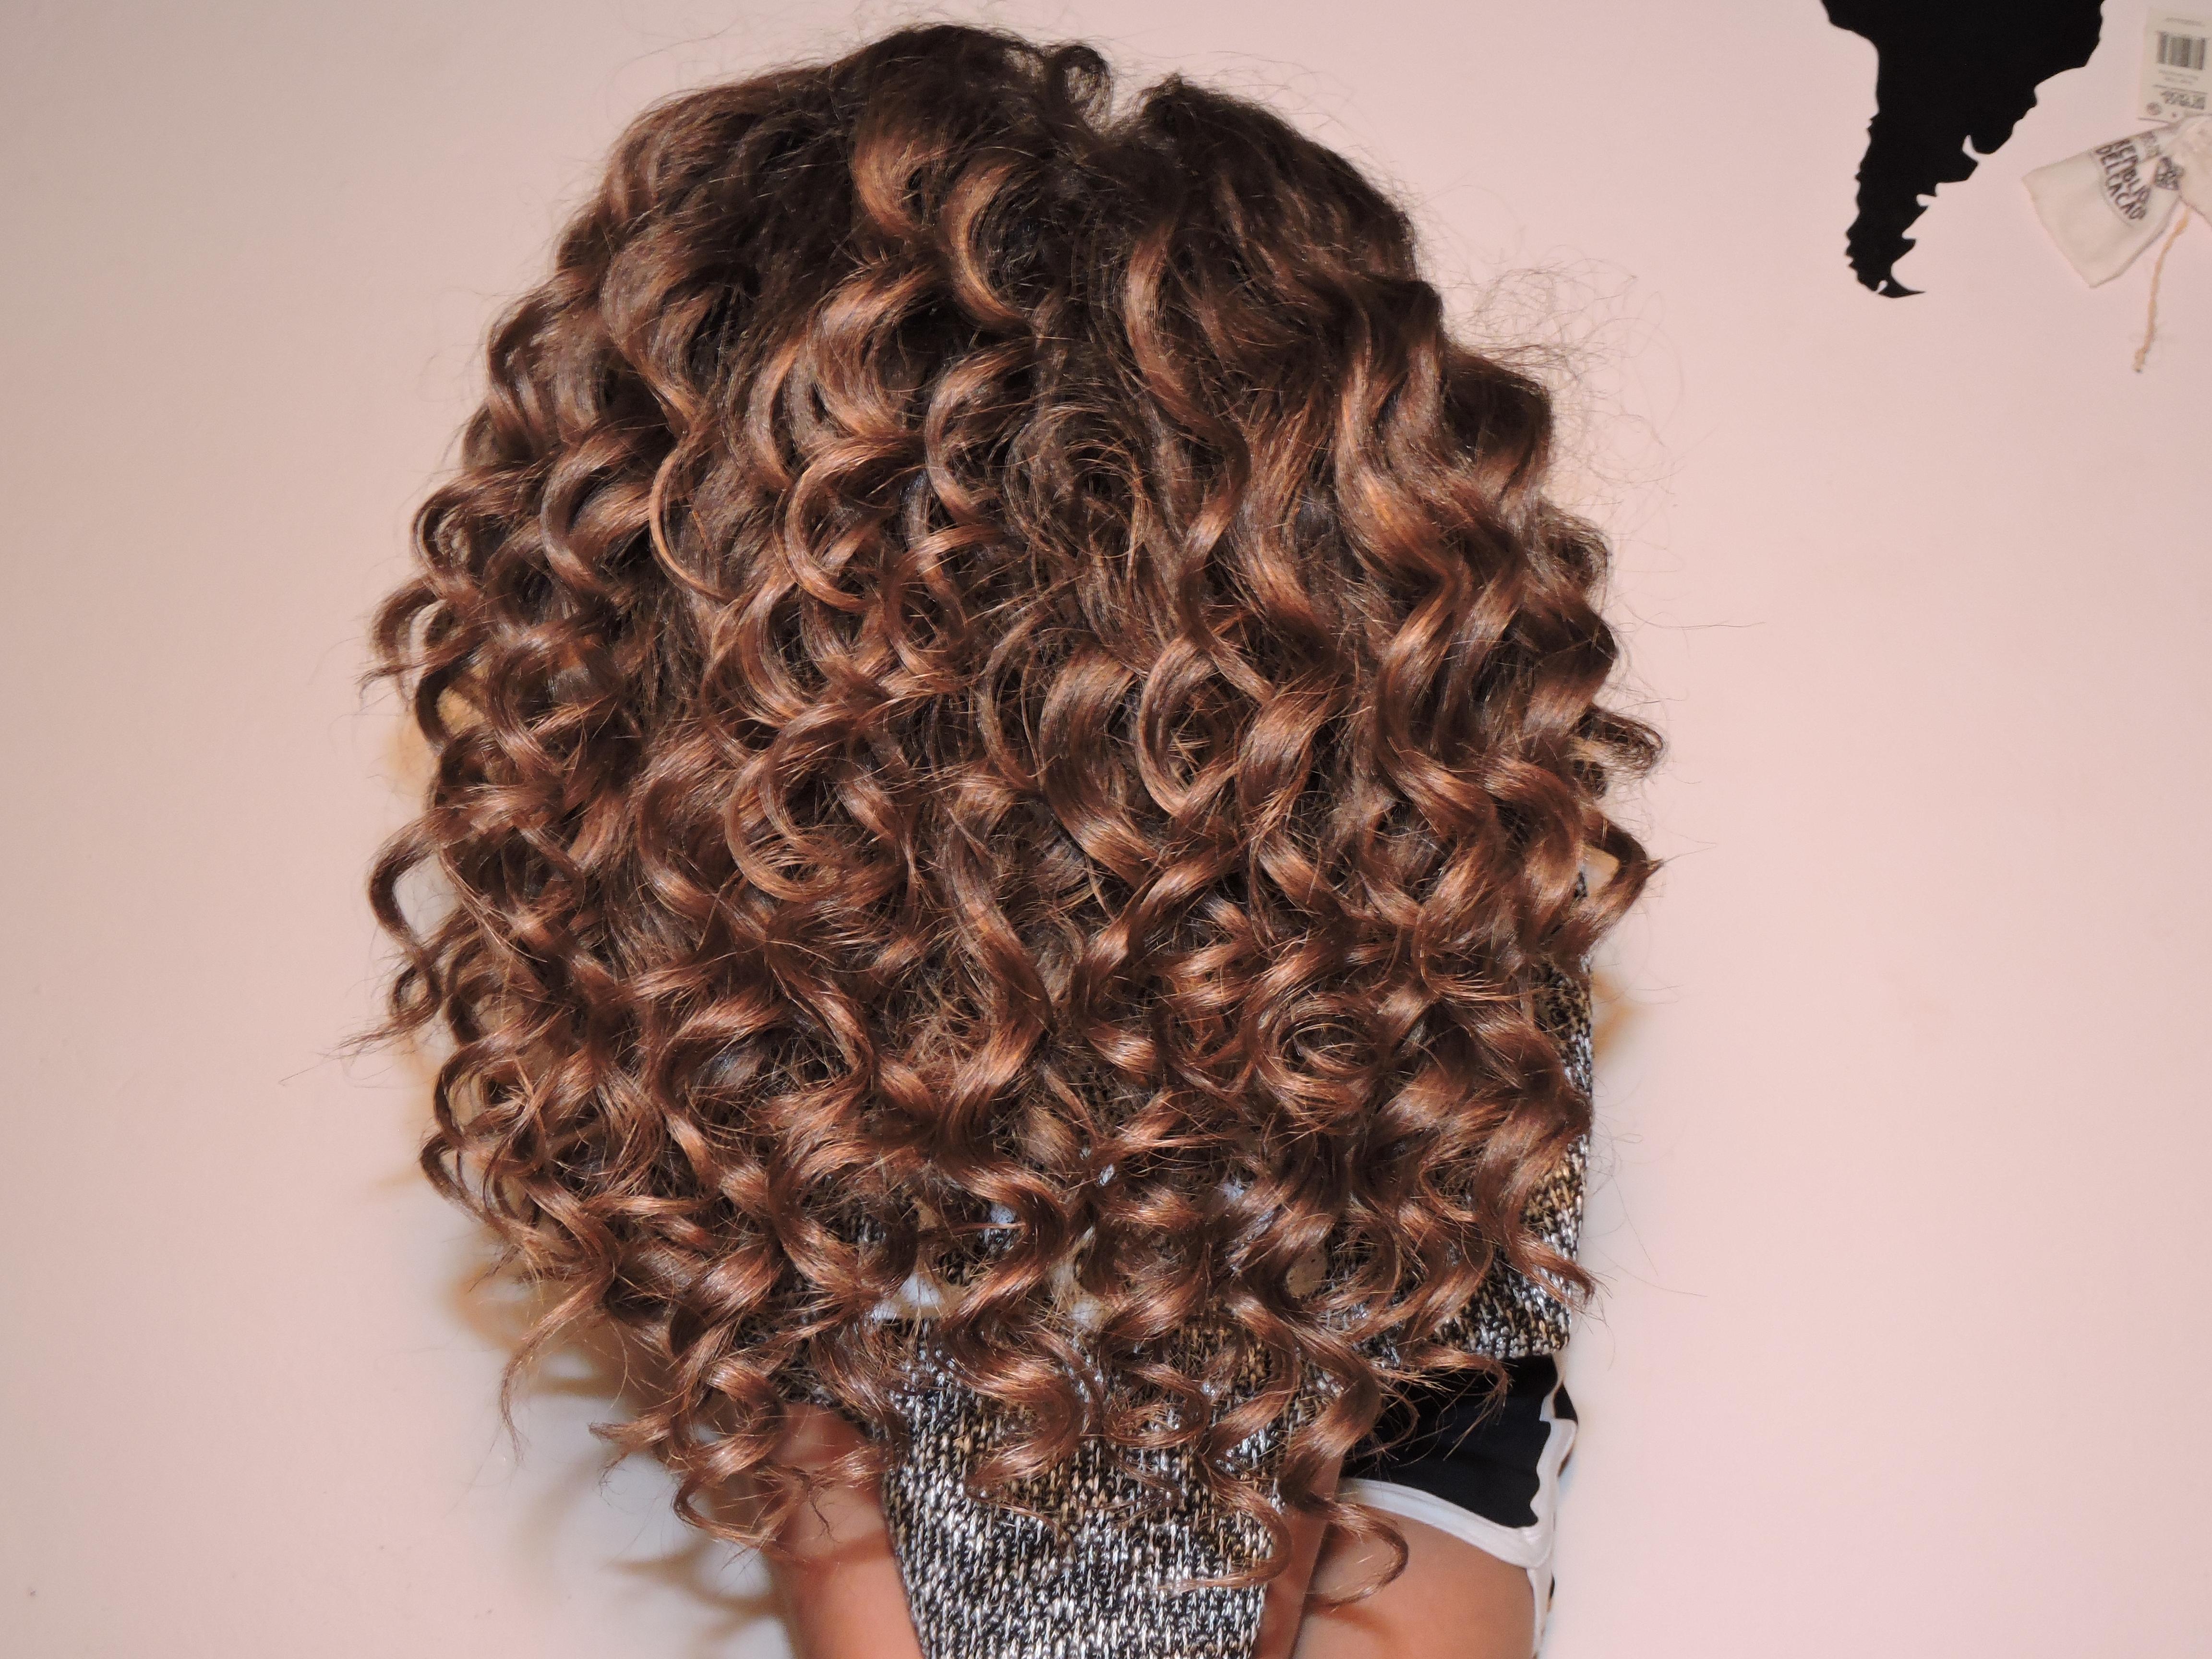 Head of Curls